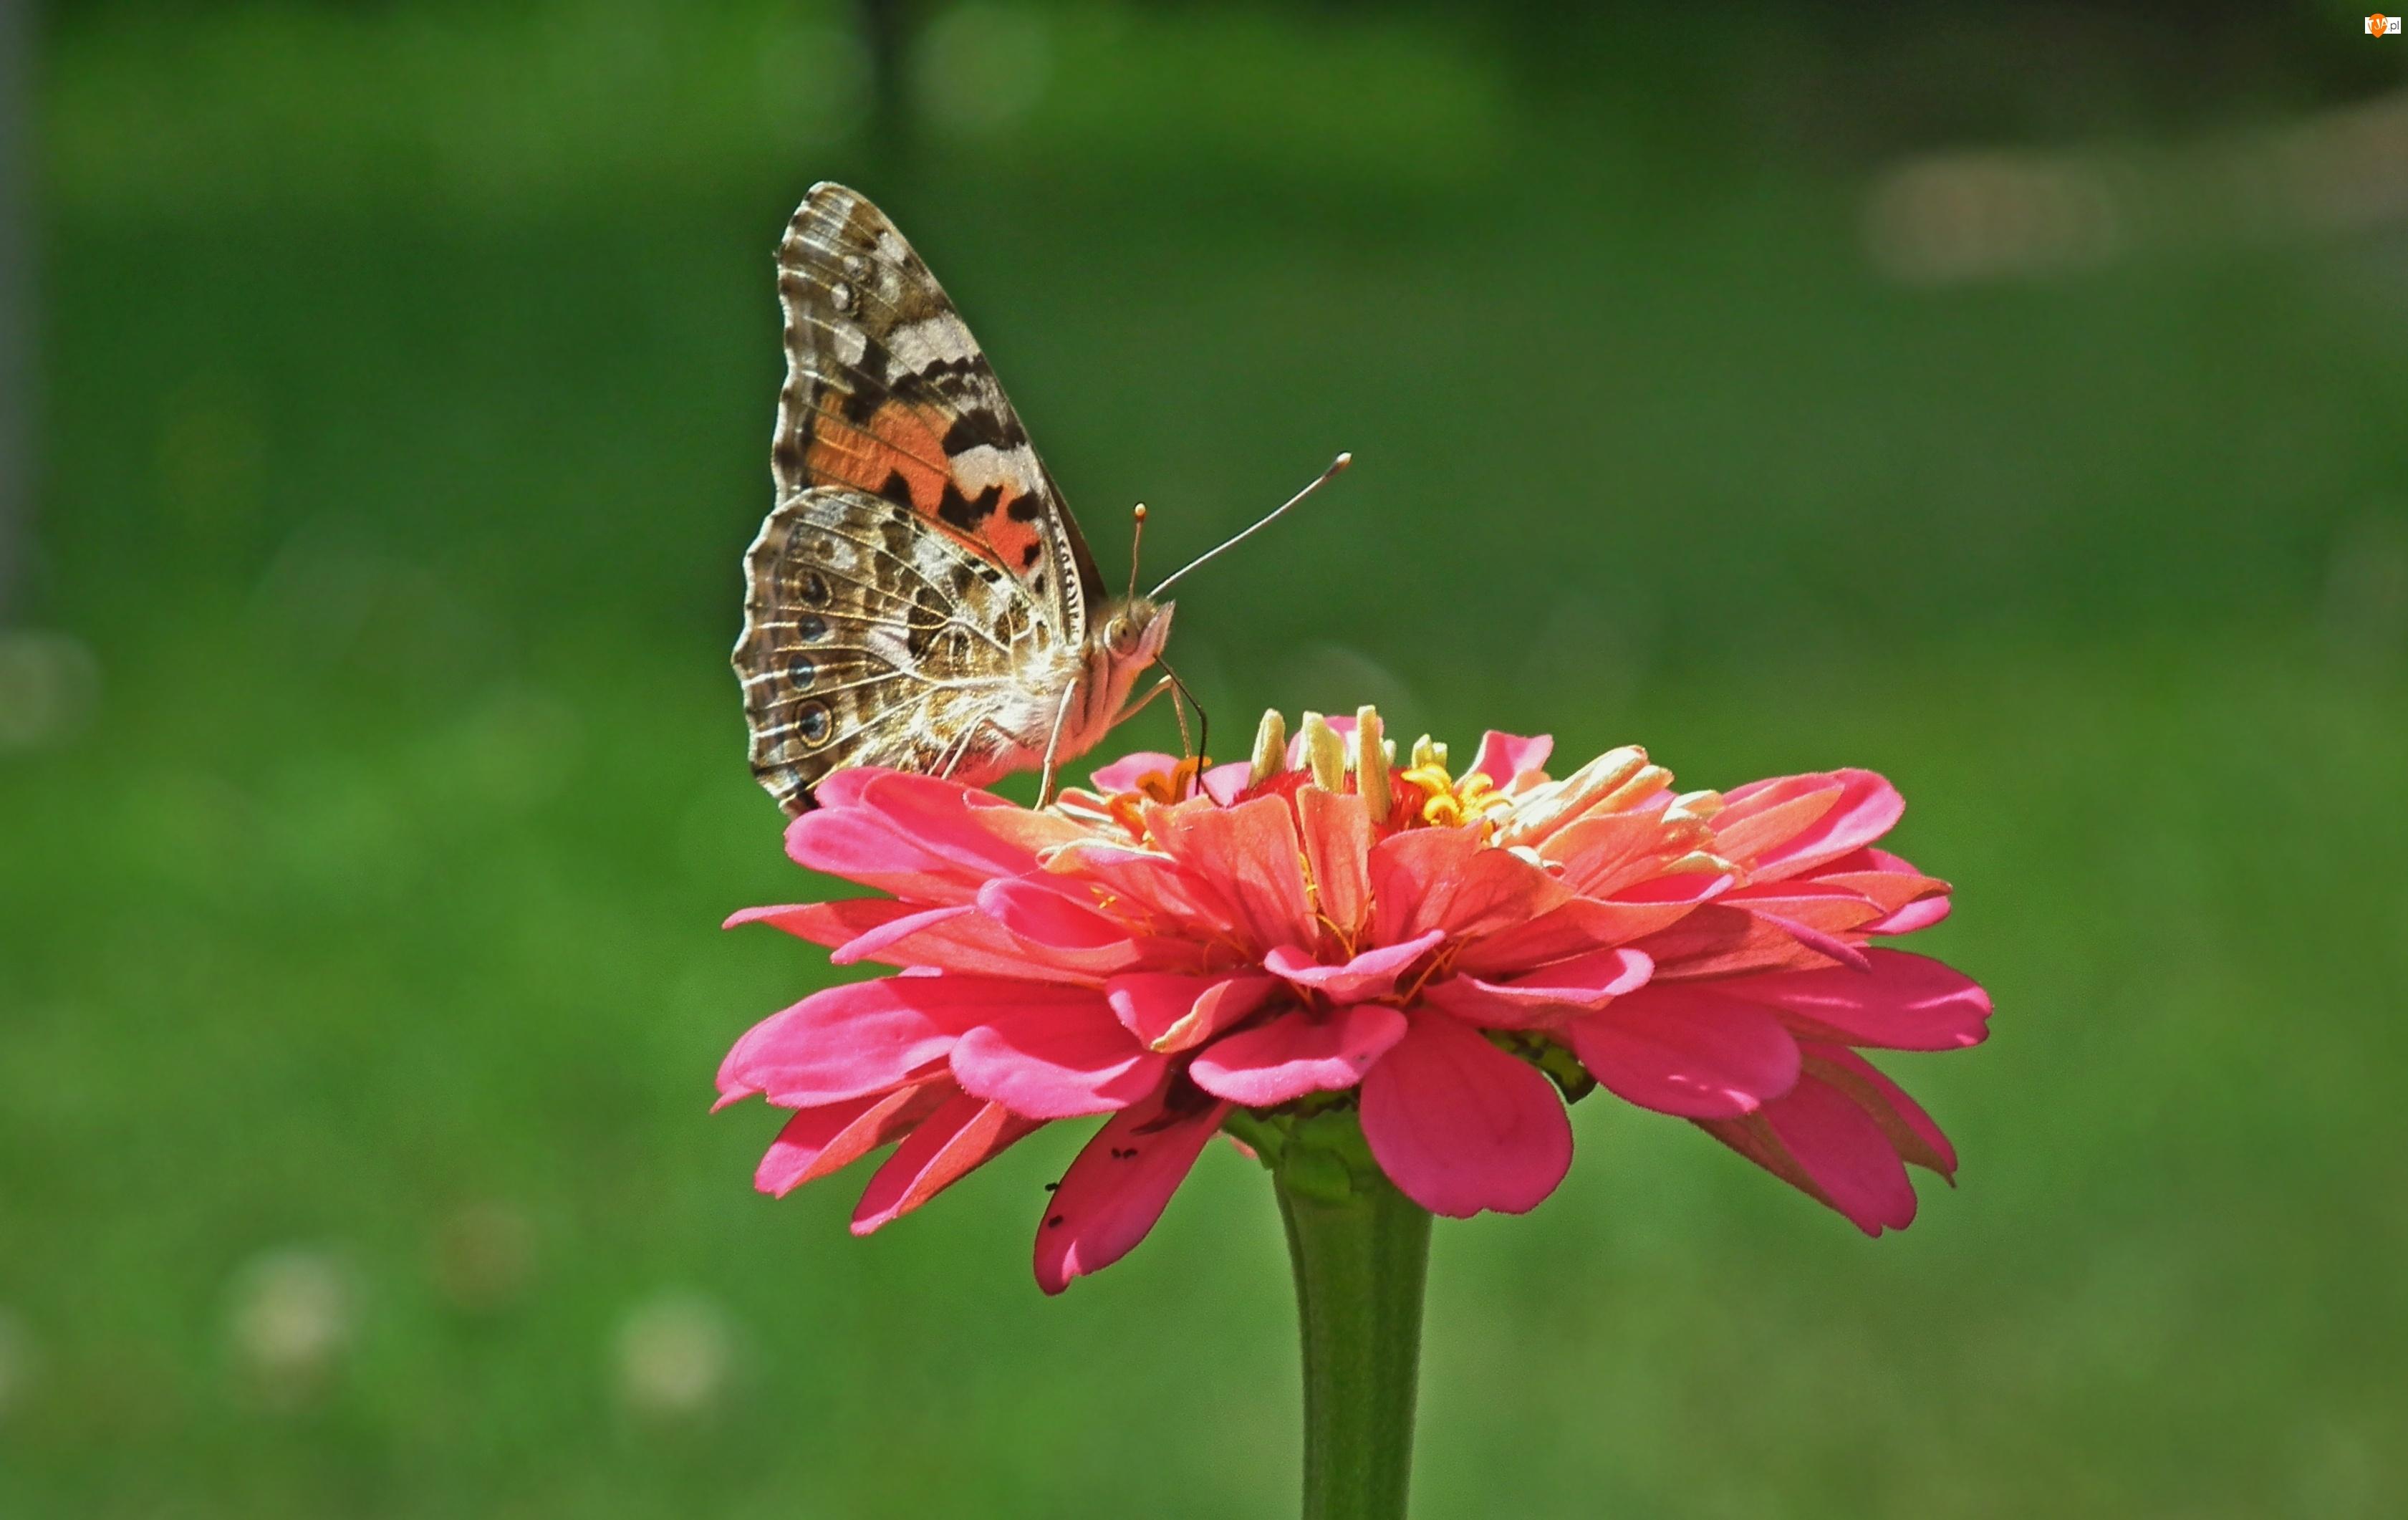 Cynia, Motyl, Osetnik, Rusałka, Kwiat